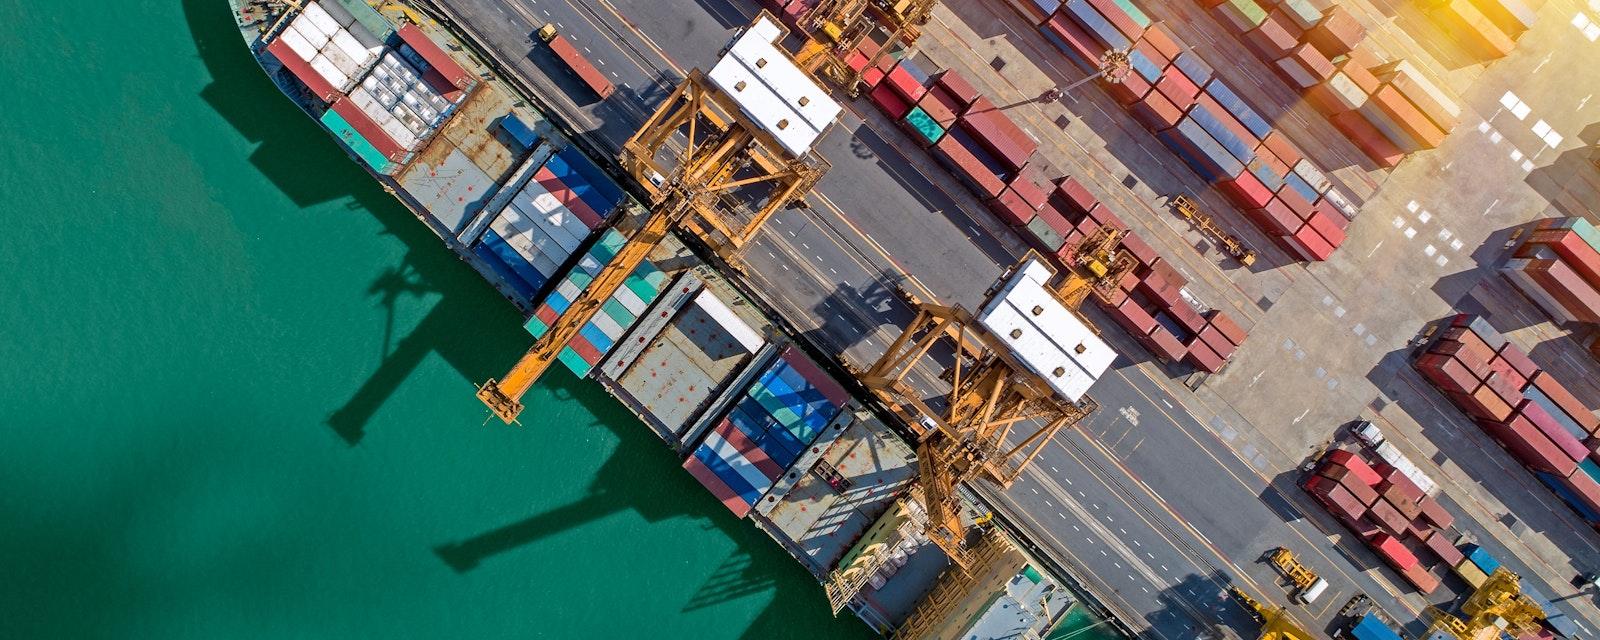 Logistics,And,Transportation,Of,Container,Cargo,Ship,And,Cargo,Plane